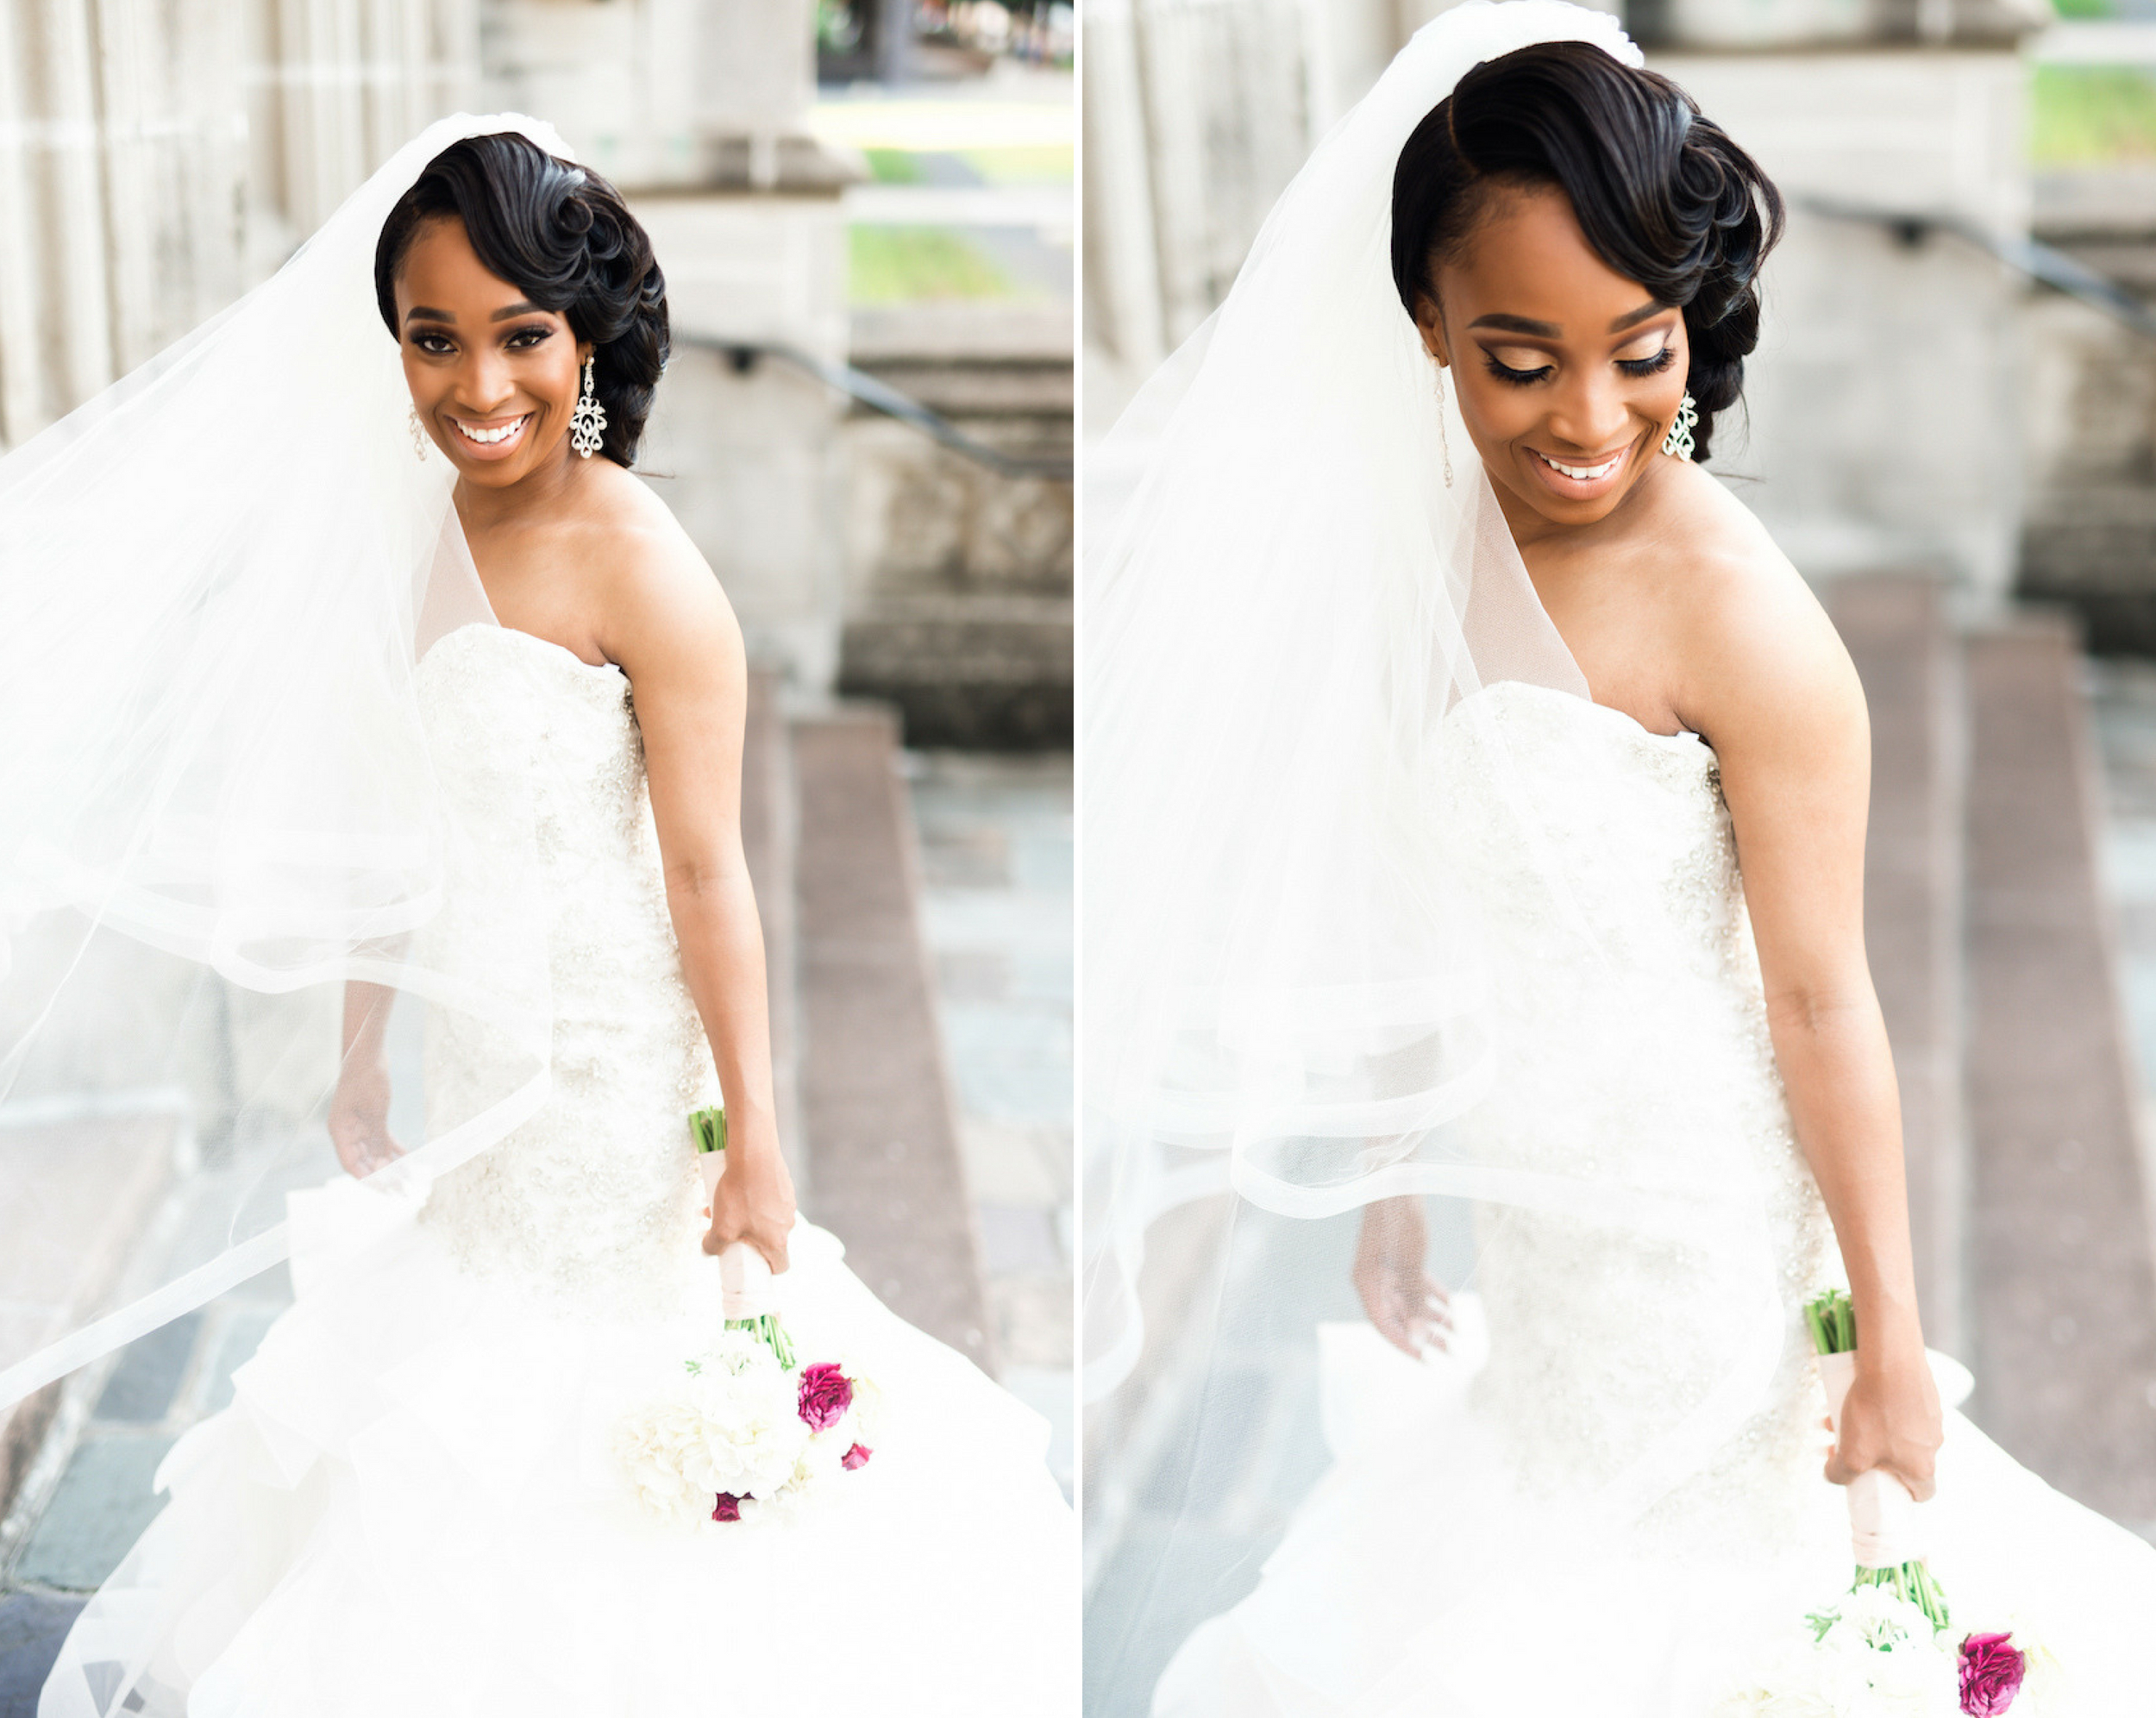 Bridal Session- Pharris Photography- Aisha- Lace Wedding Dress- Texas